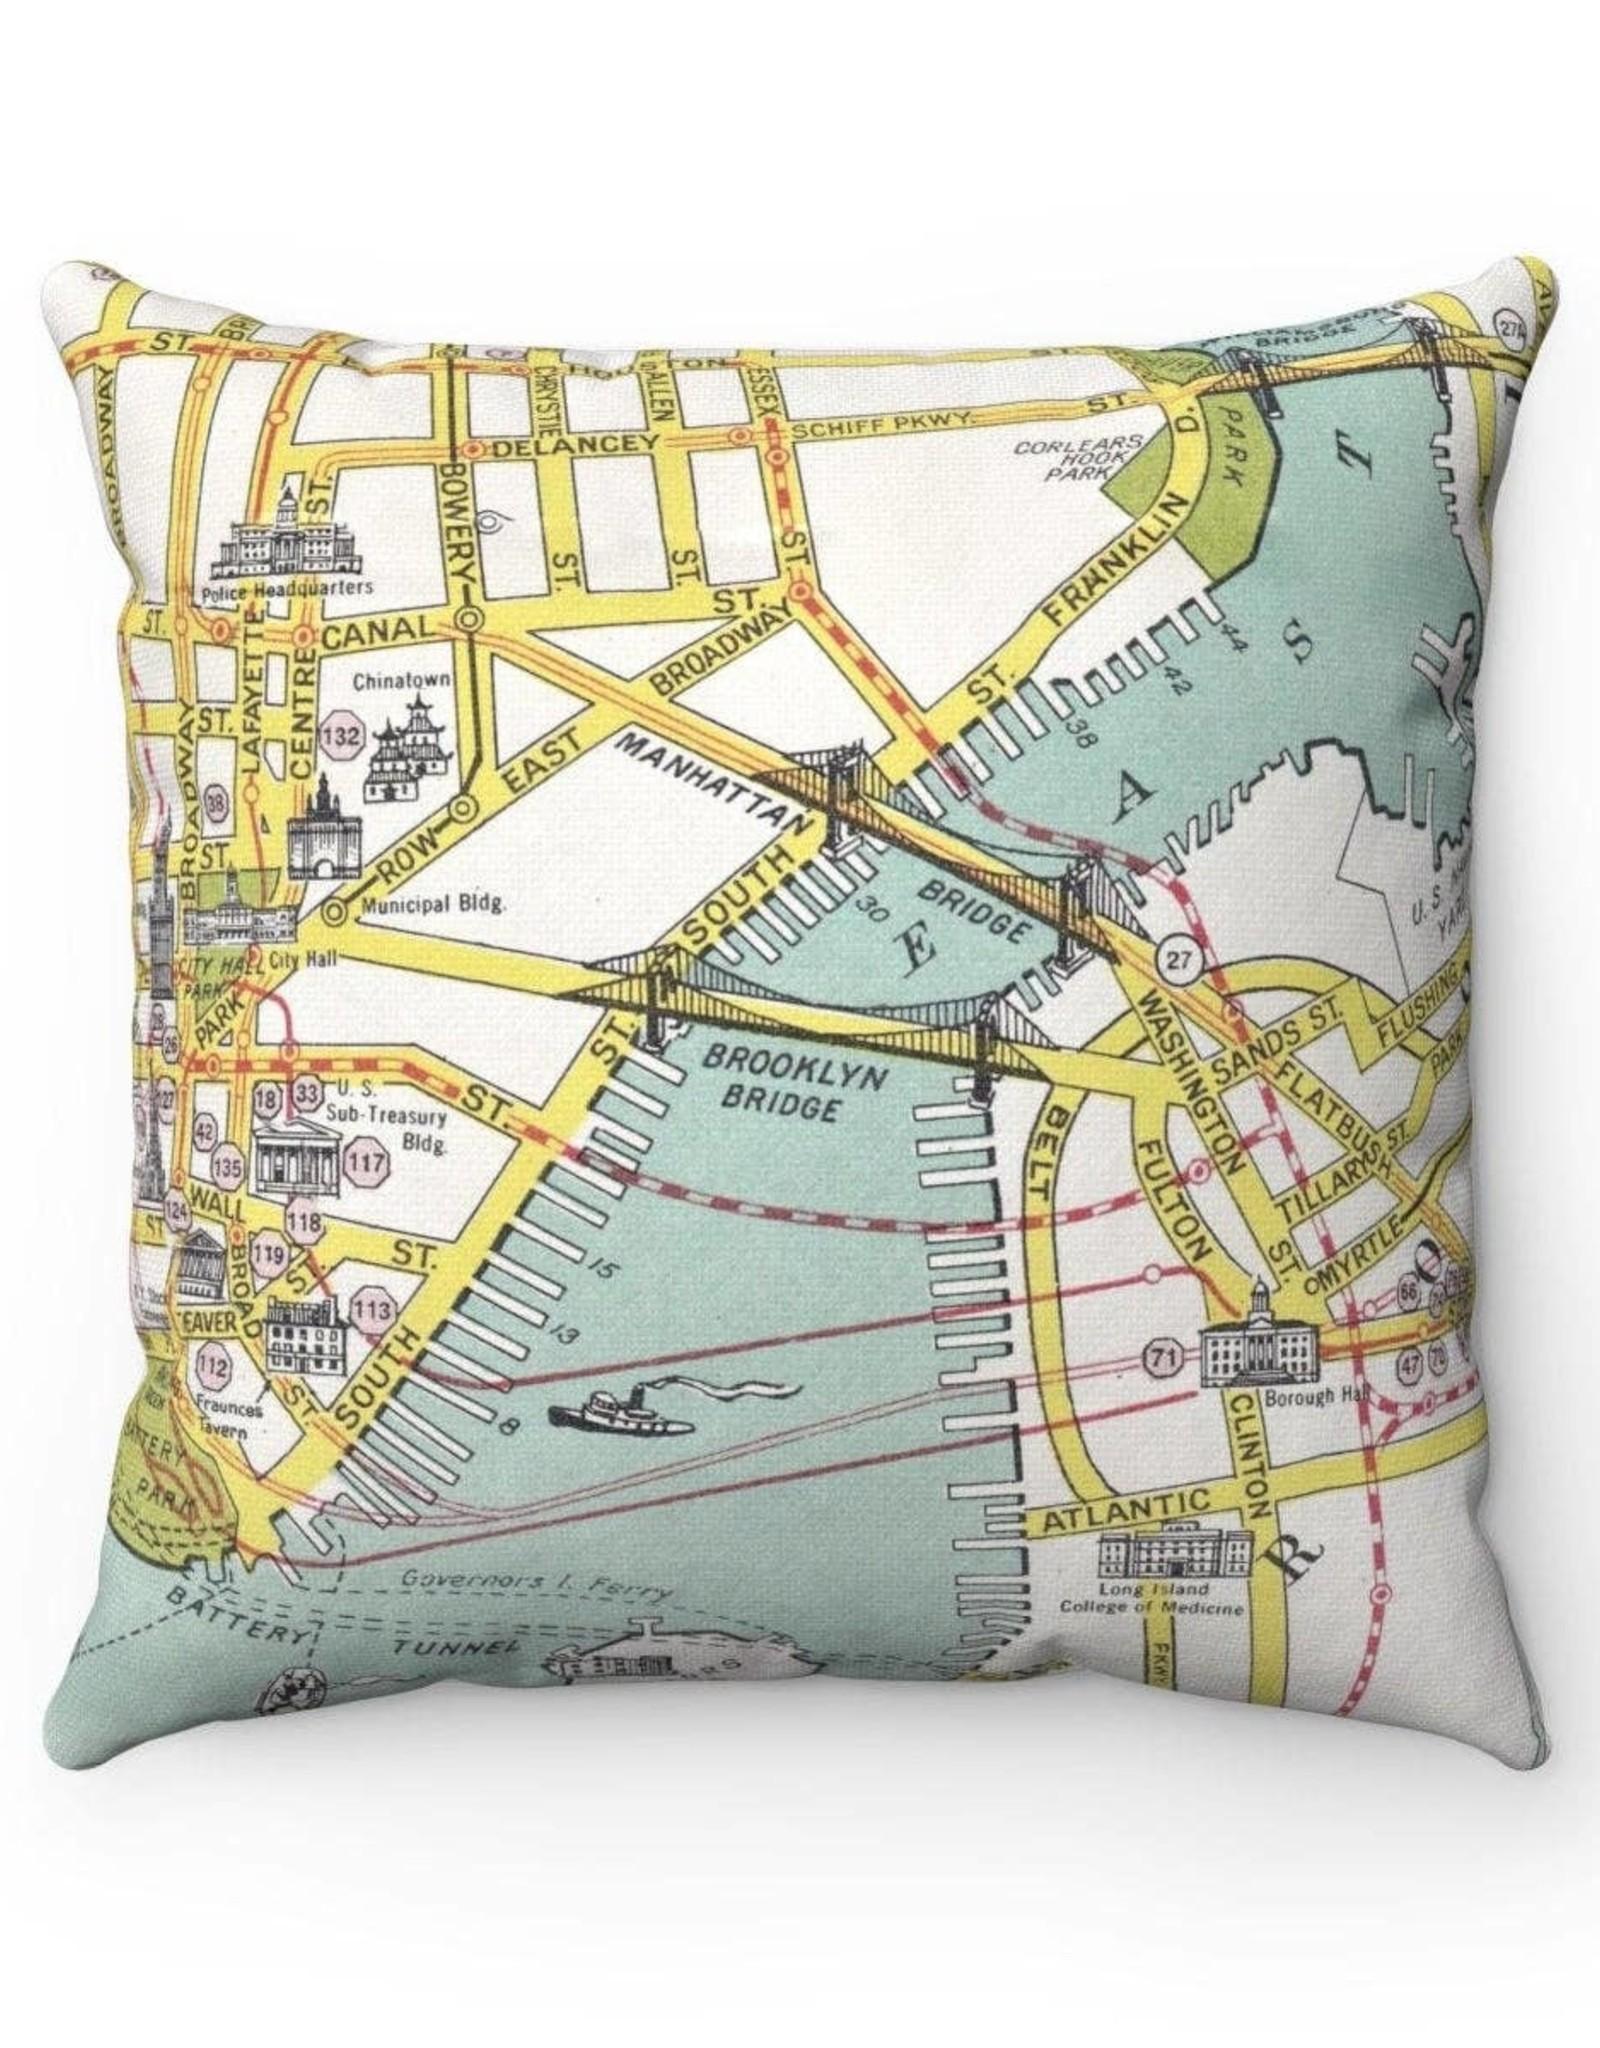 Daisy Mae Designs Pillow - Brooklyn Bridge